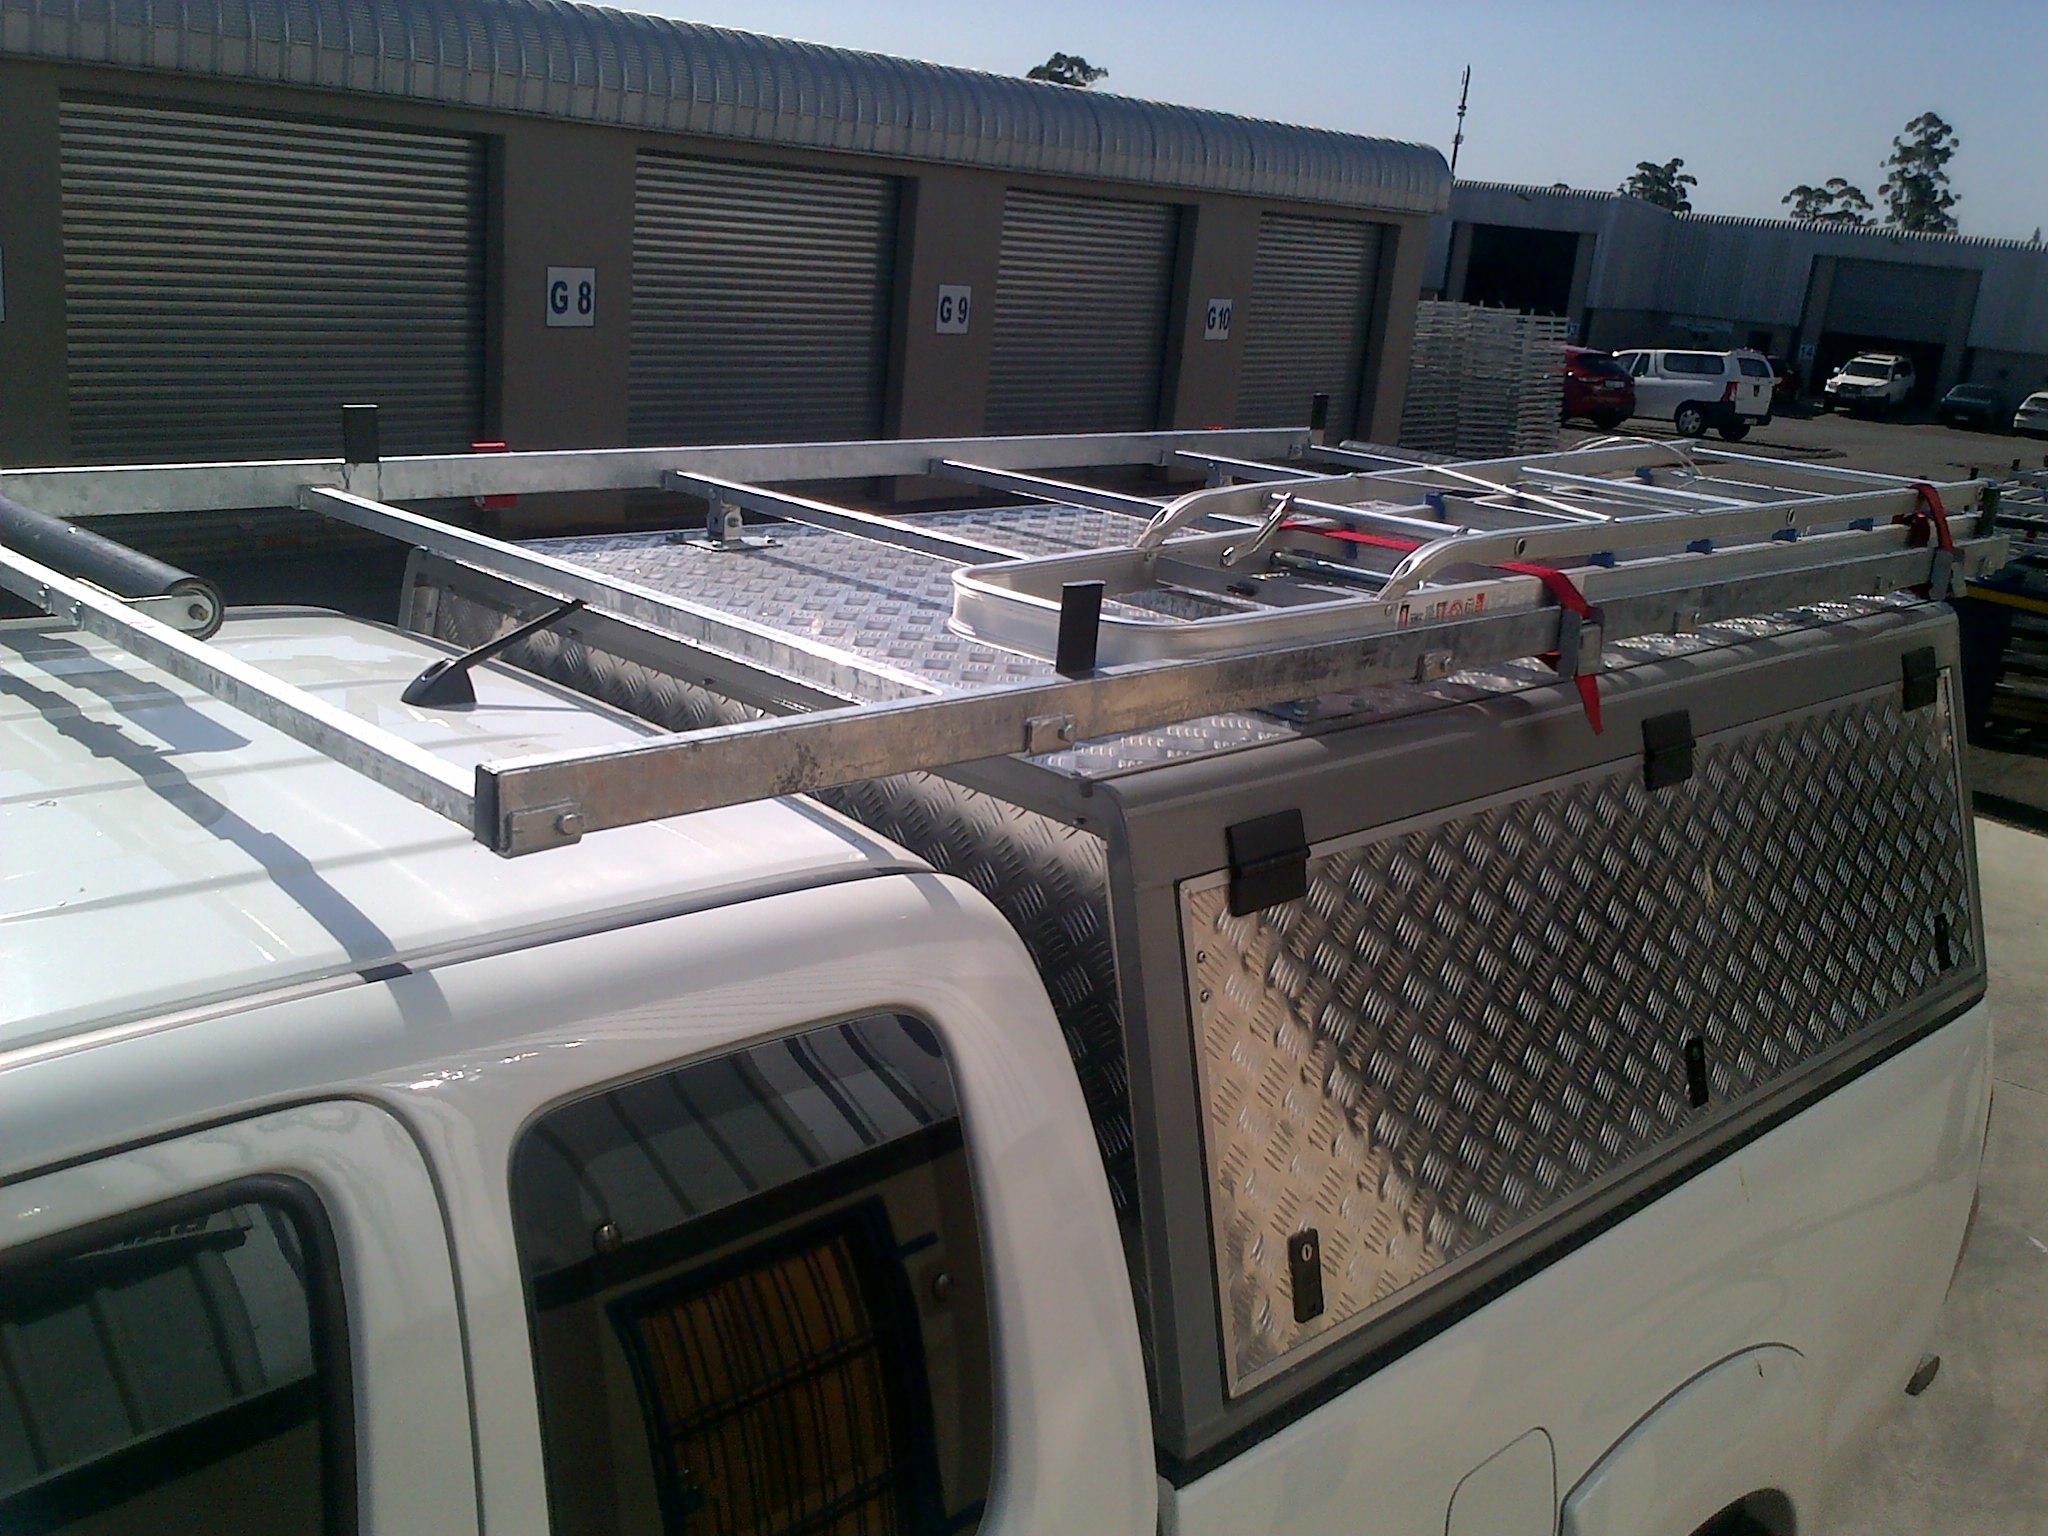 Telkom Roof And Ladder Racks